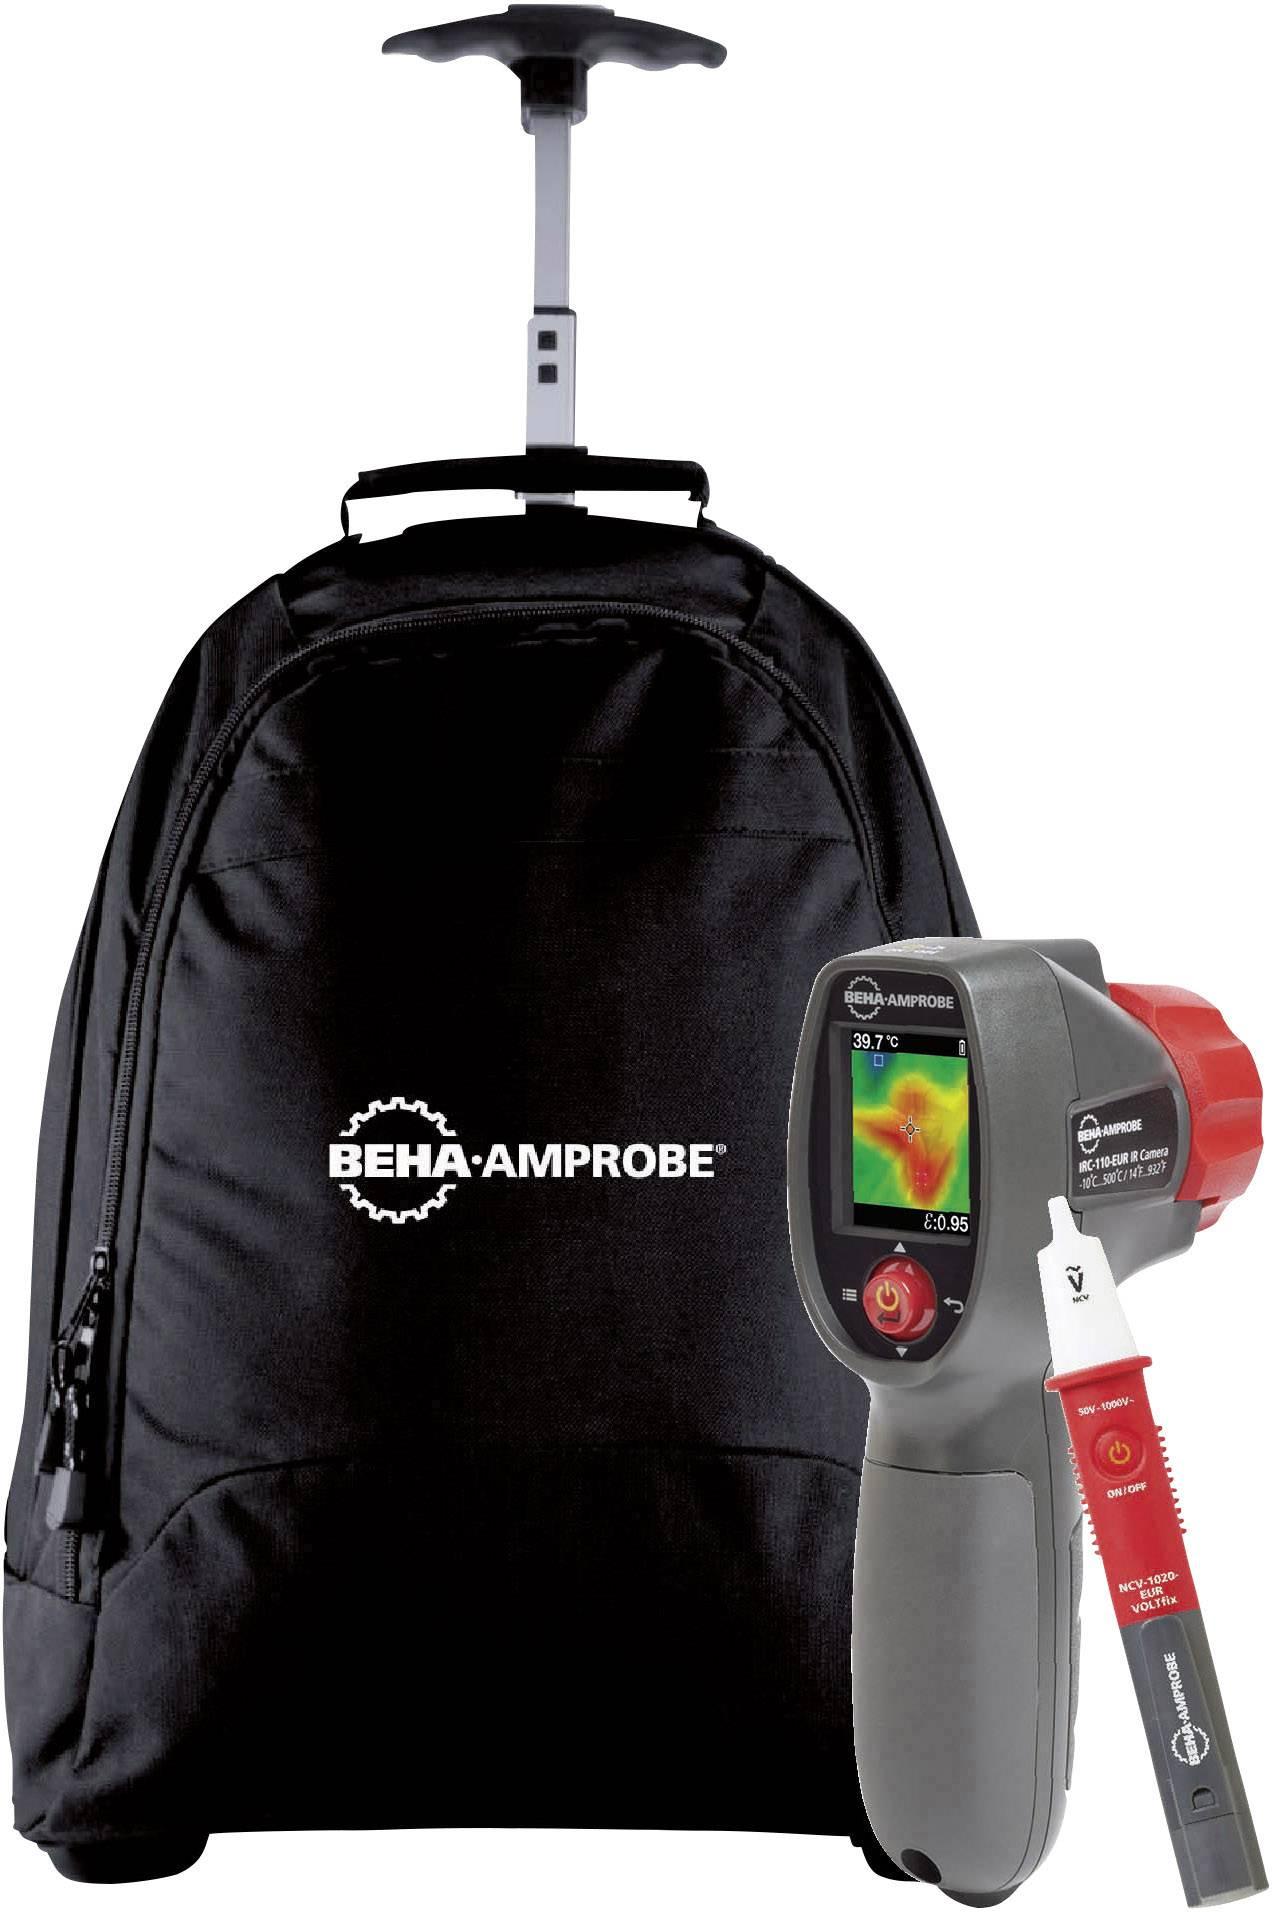 Termokamera Beha Amprobe IRC-110-EUR KIT1 5043676, 128 x 128 pix